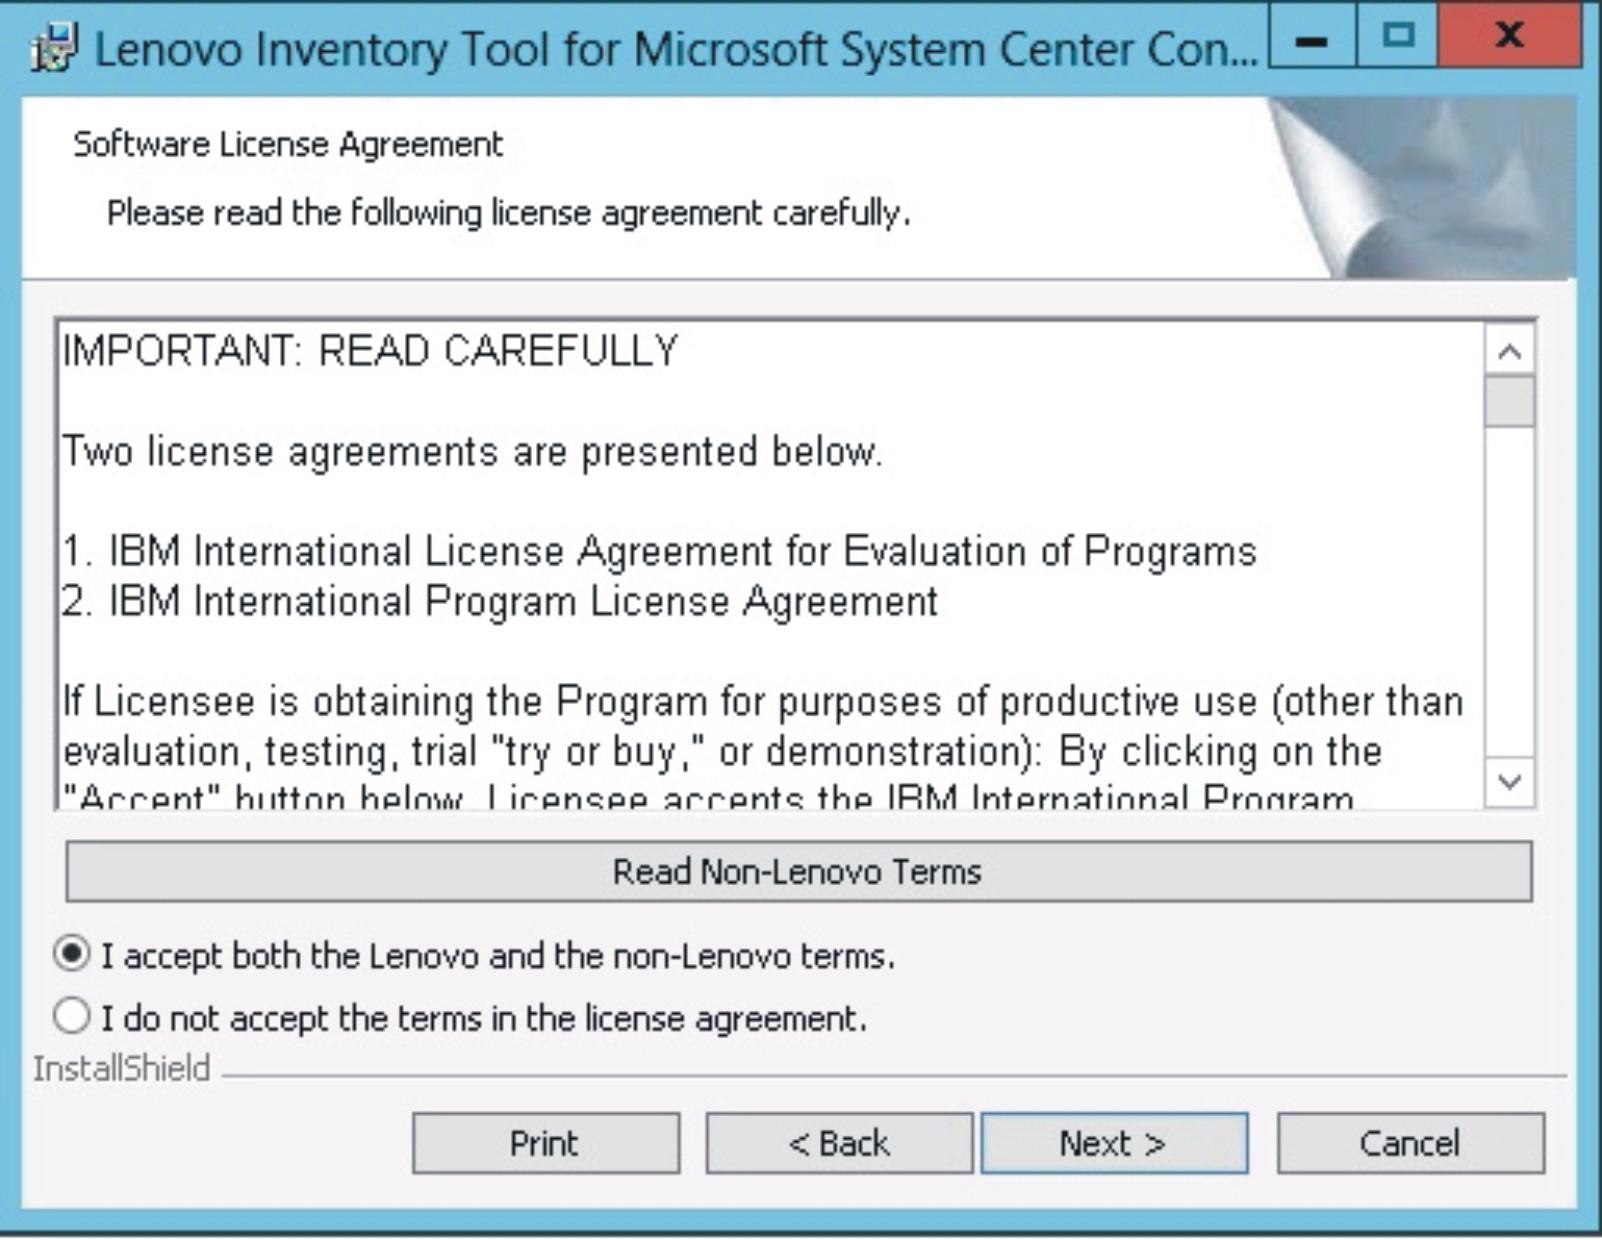 Installing lenovo inventory tool installing lenovo inventory tool platinumwayz